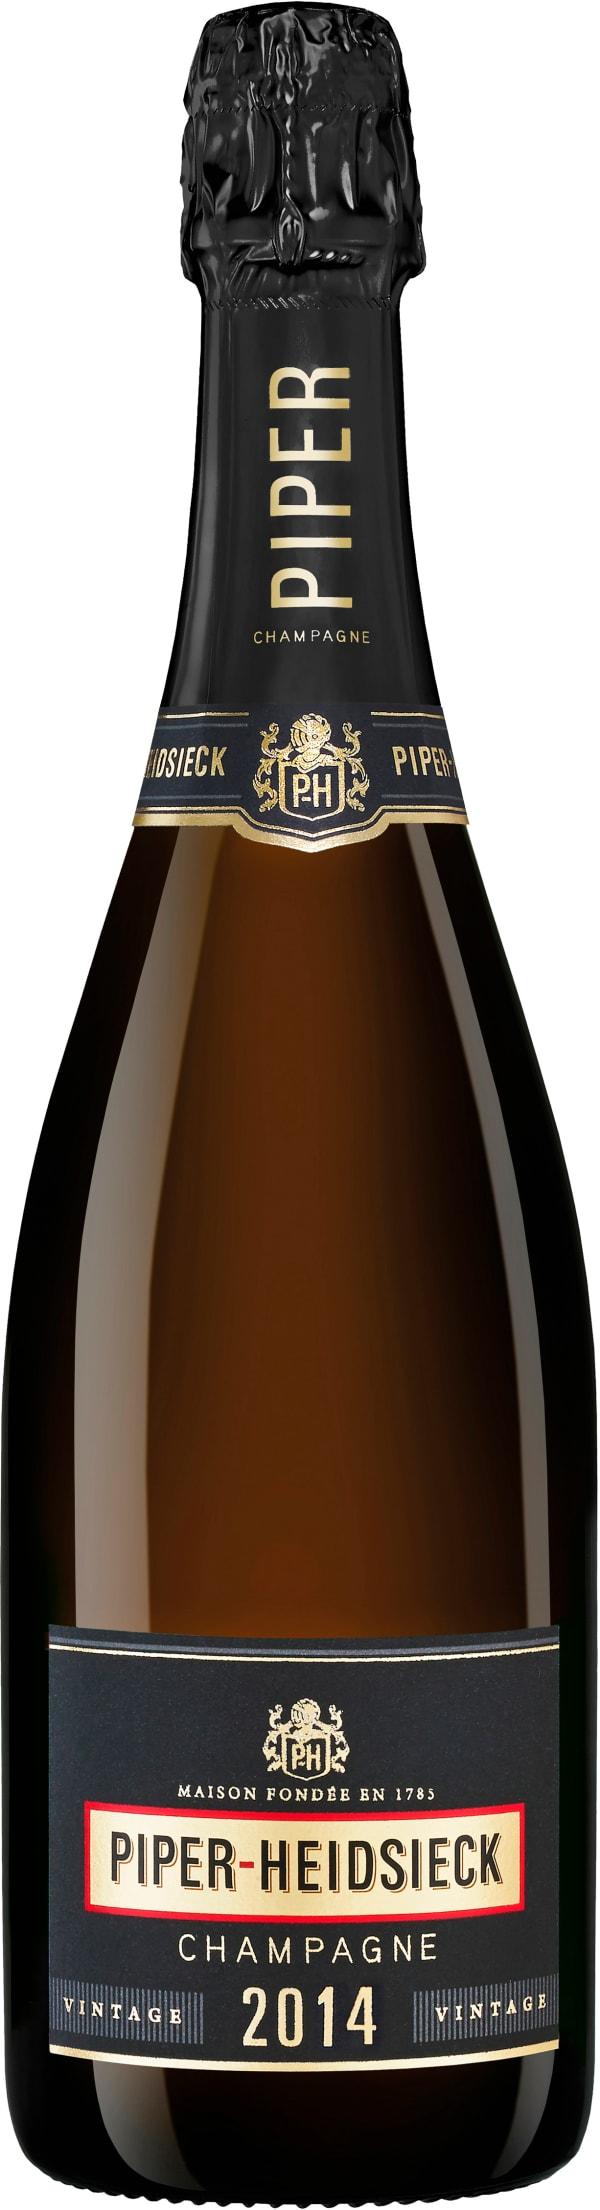 Piper-Heidsieck Vintage Champagne Brut 2012